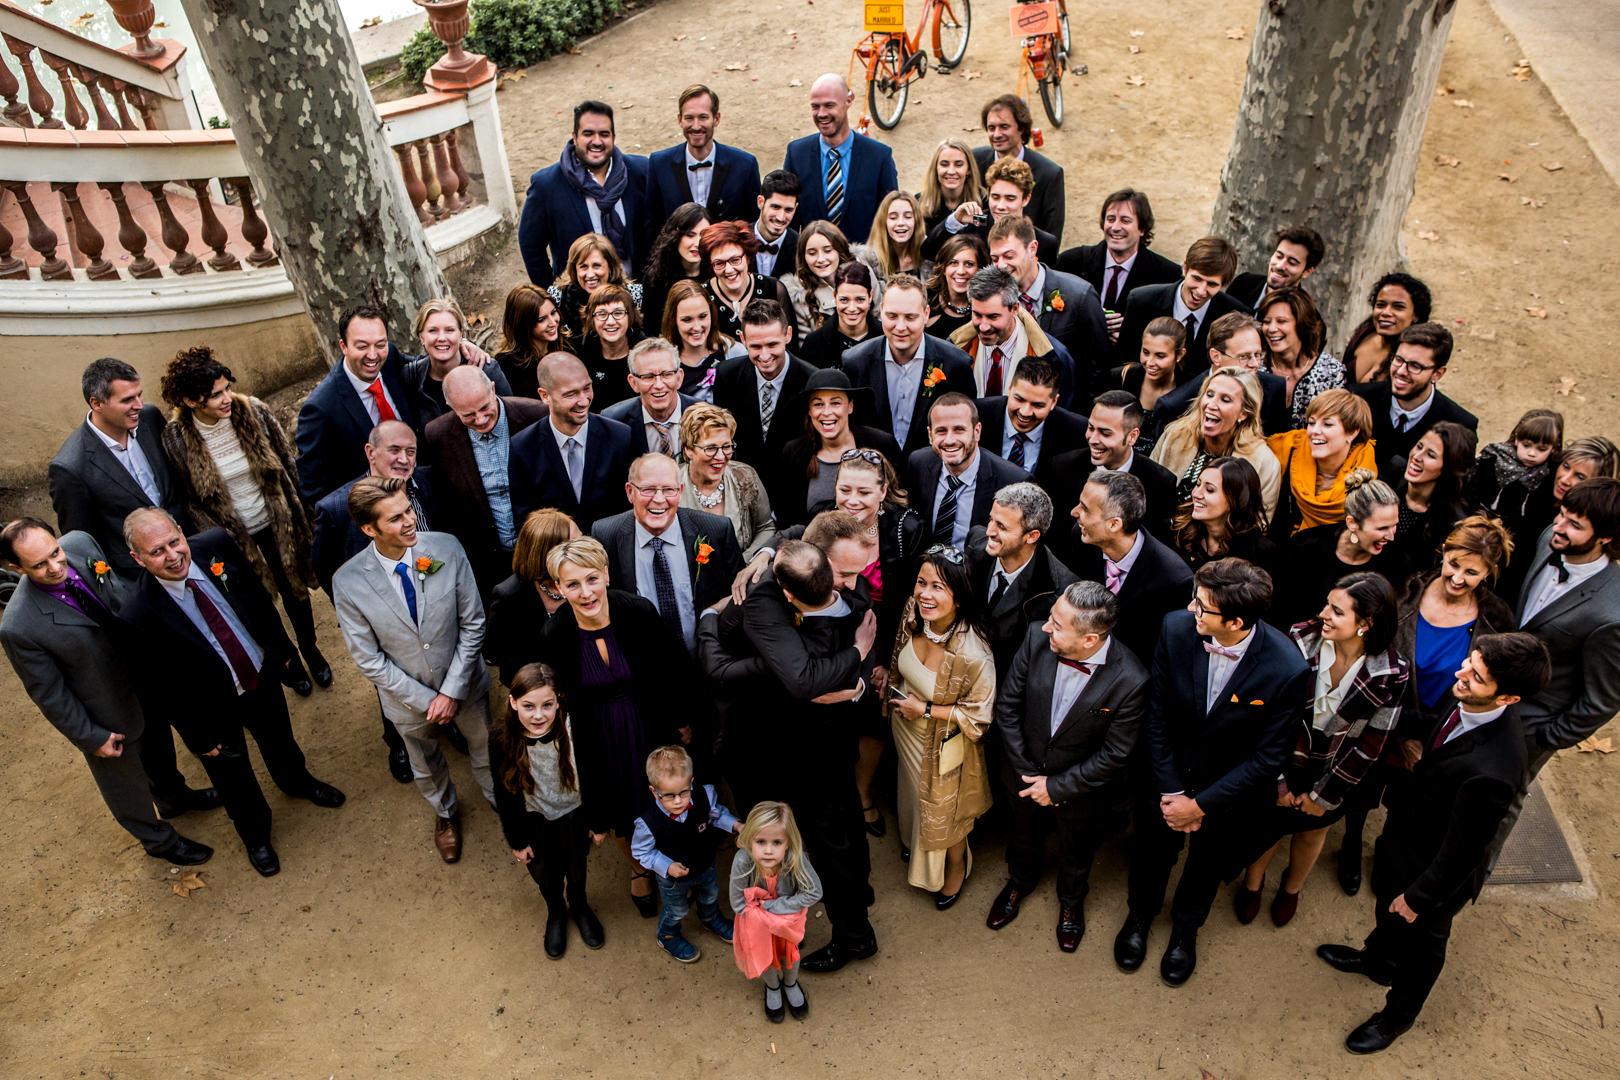 Same-sex-wedding-barcelona-boda- gay-samesex-engagement-Rafael-Torres-fotografo-bodas-sevilla-madrid-barcelona-wedding-photographer--27.jpg